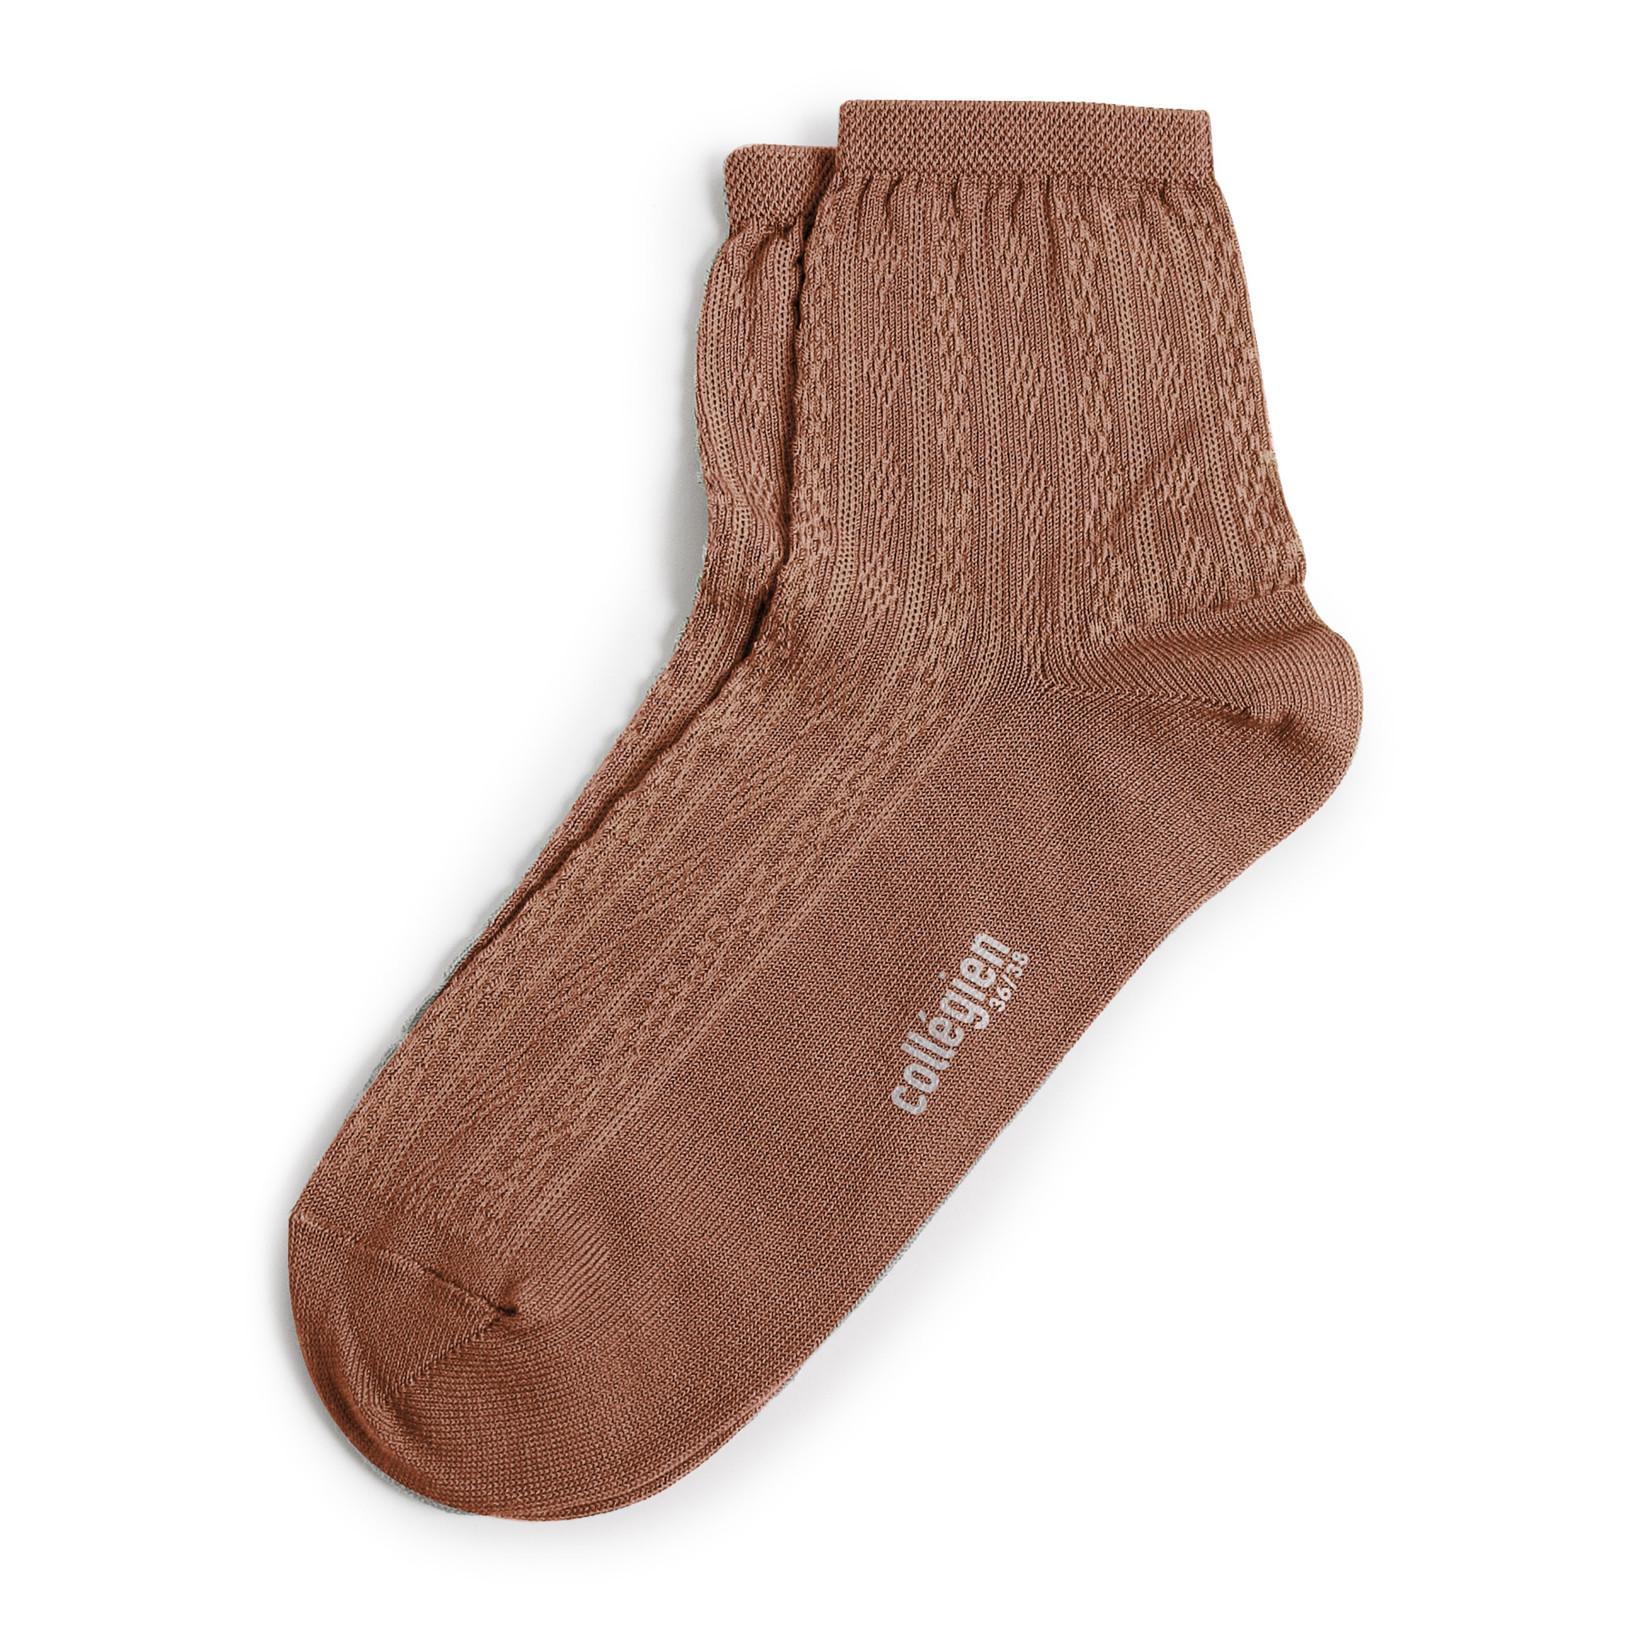 COLLEGIËN COLLEGIËN antoinette korte sokken PRALINE